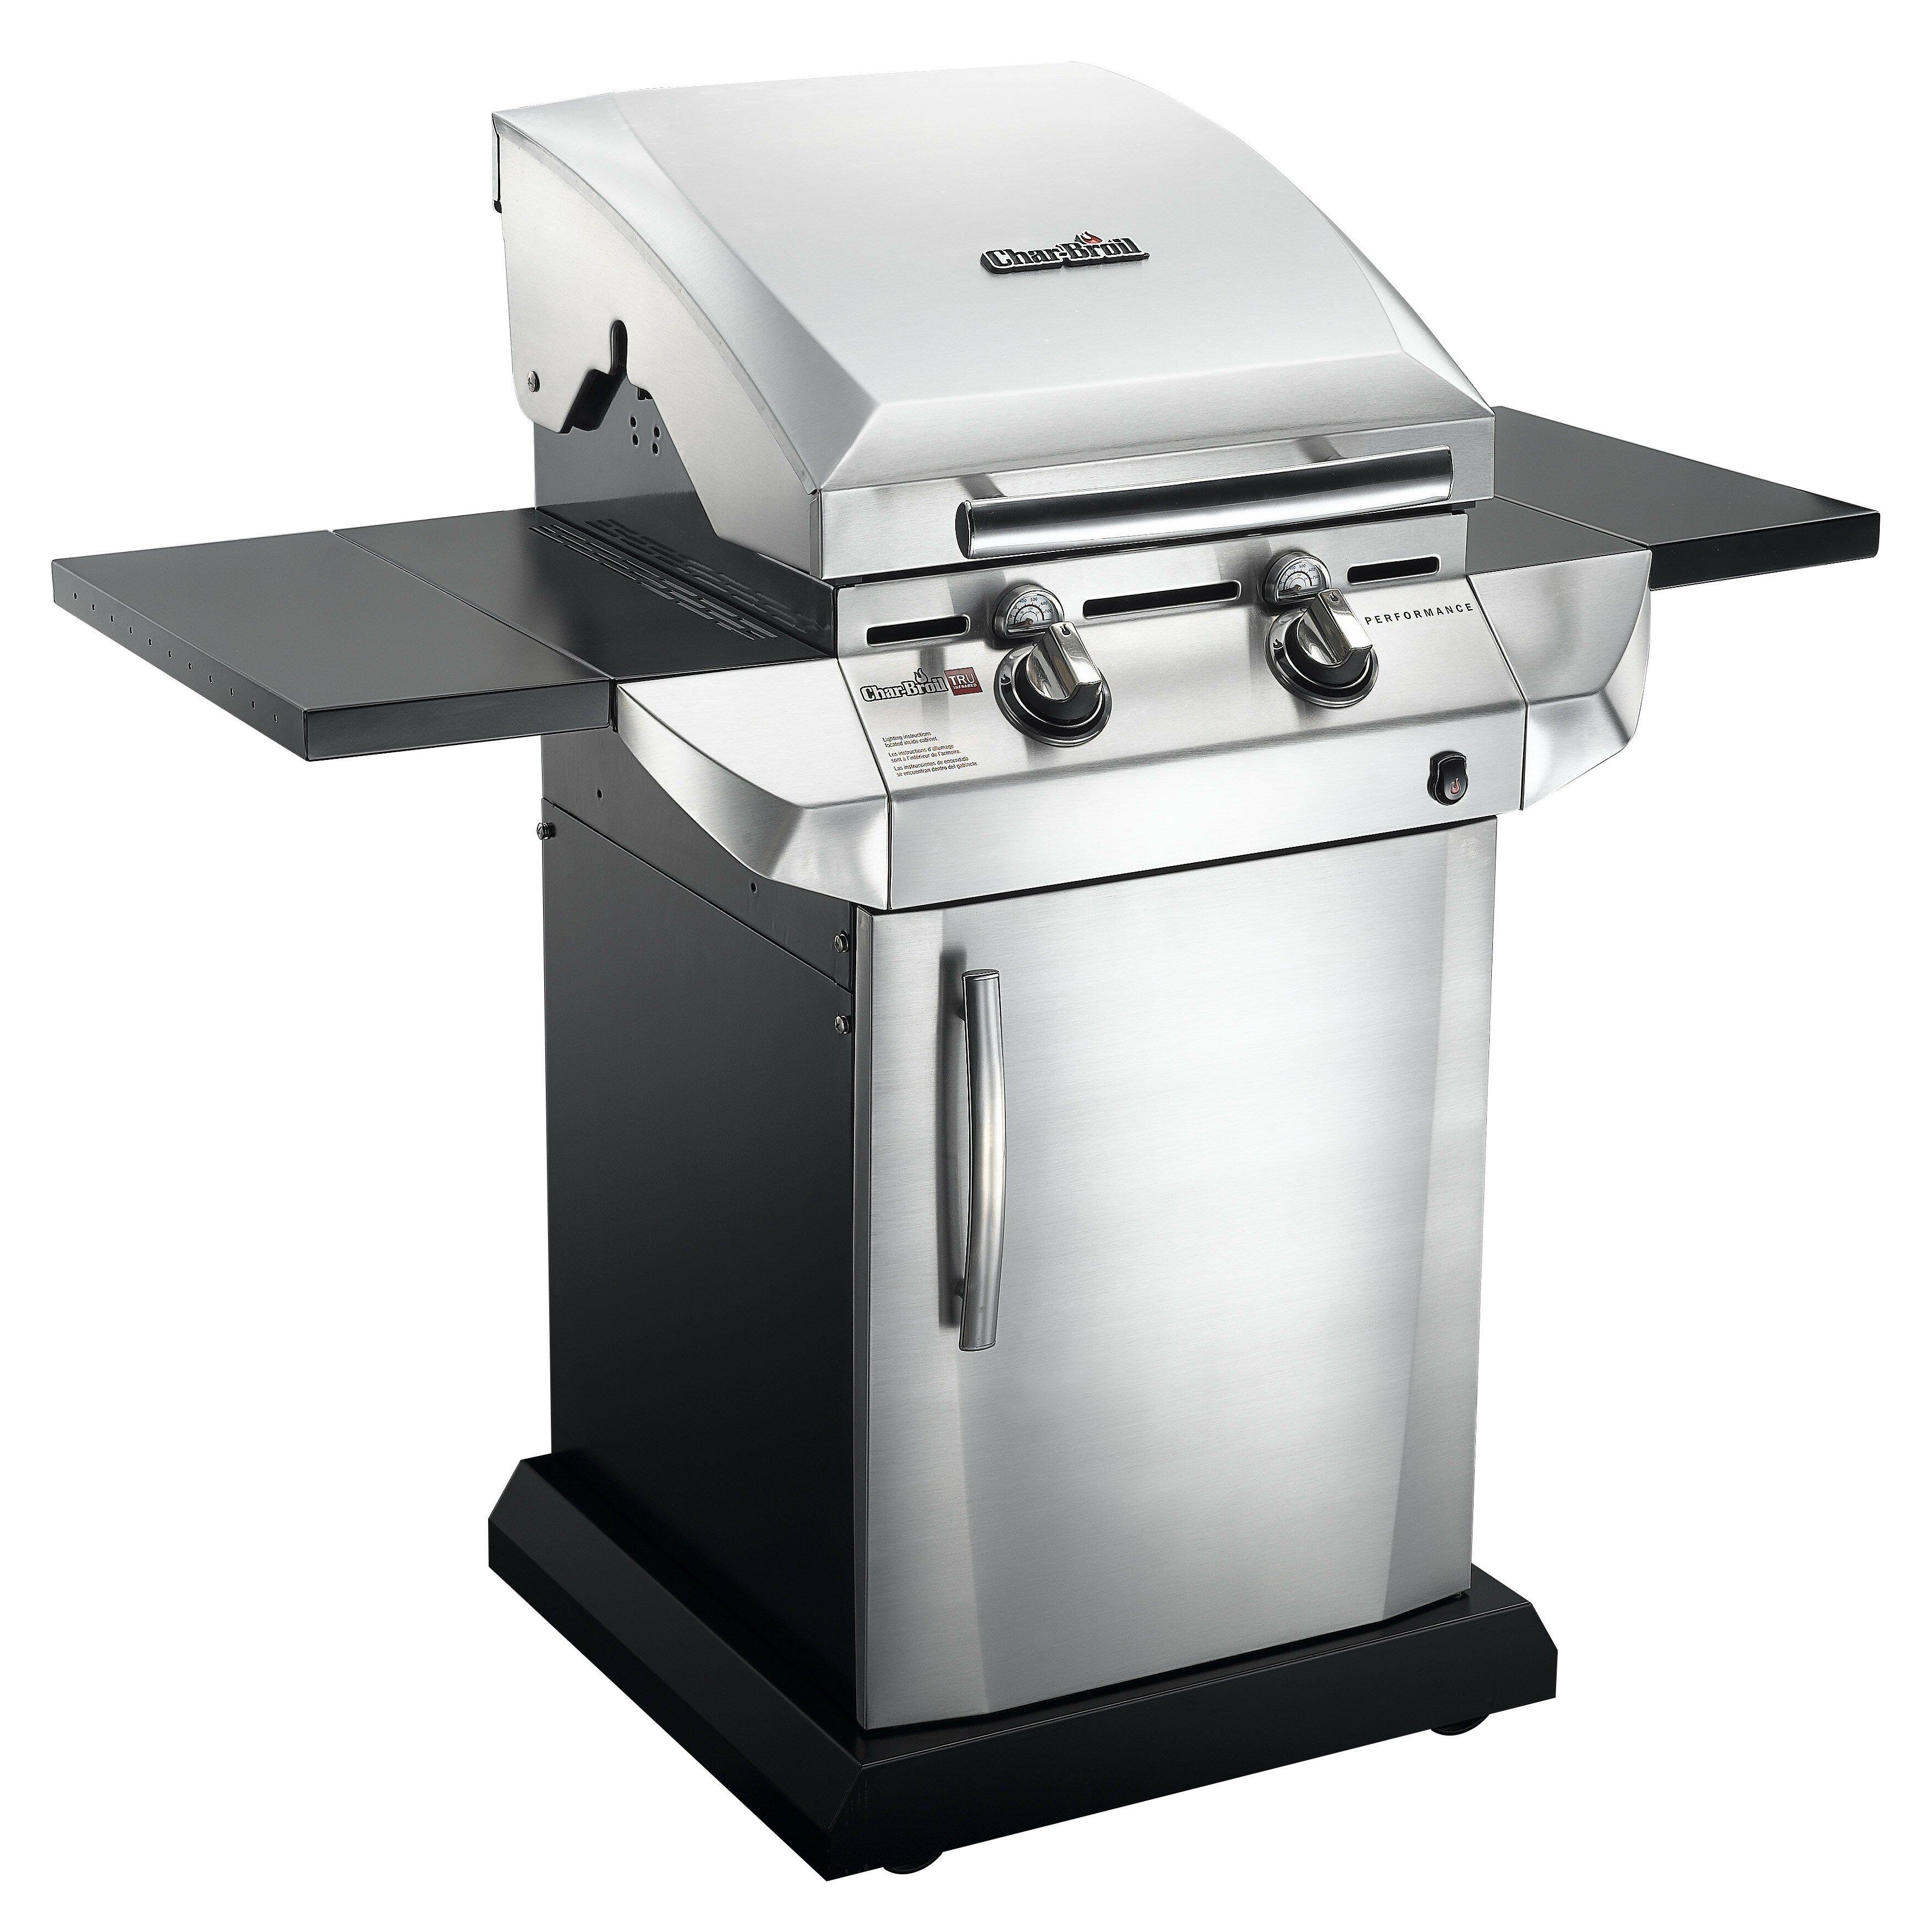 char broil 2 burner gas grill manual